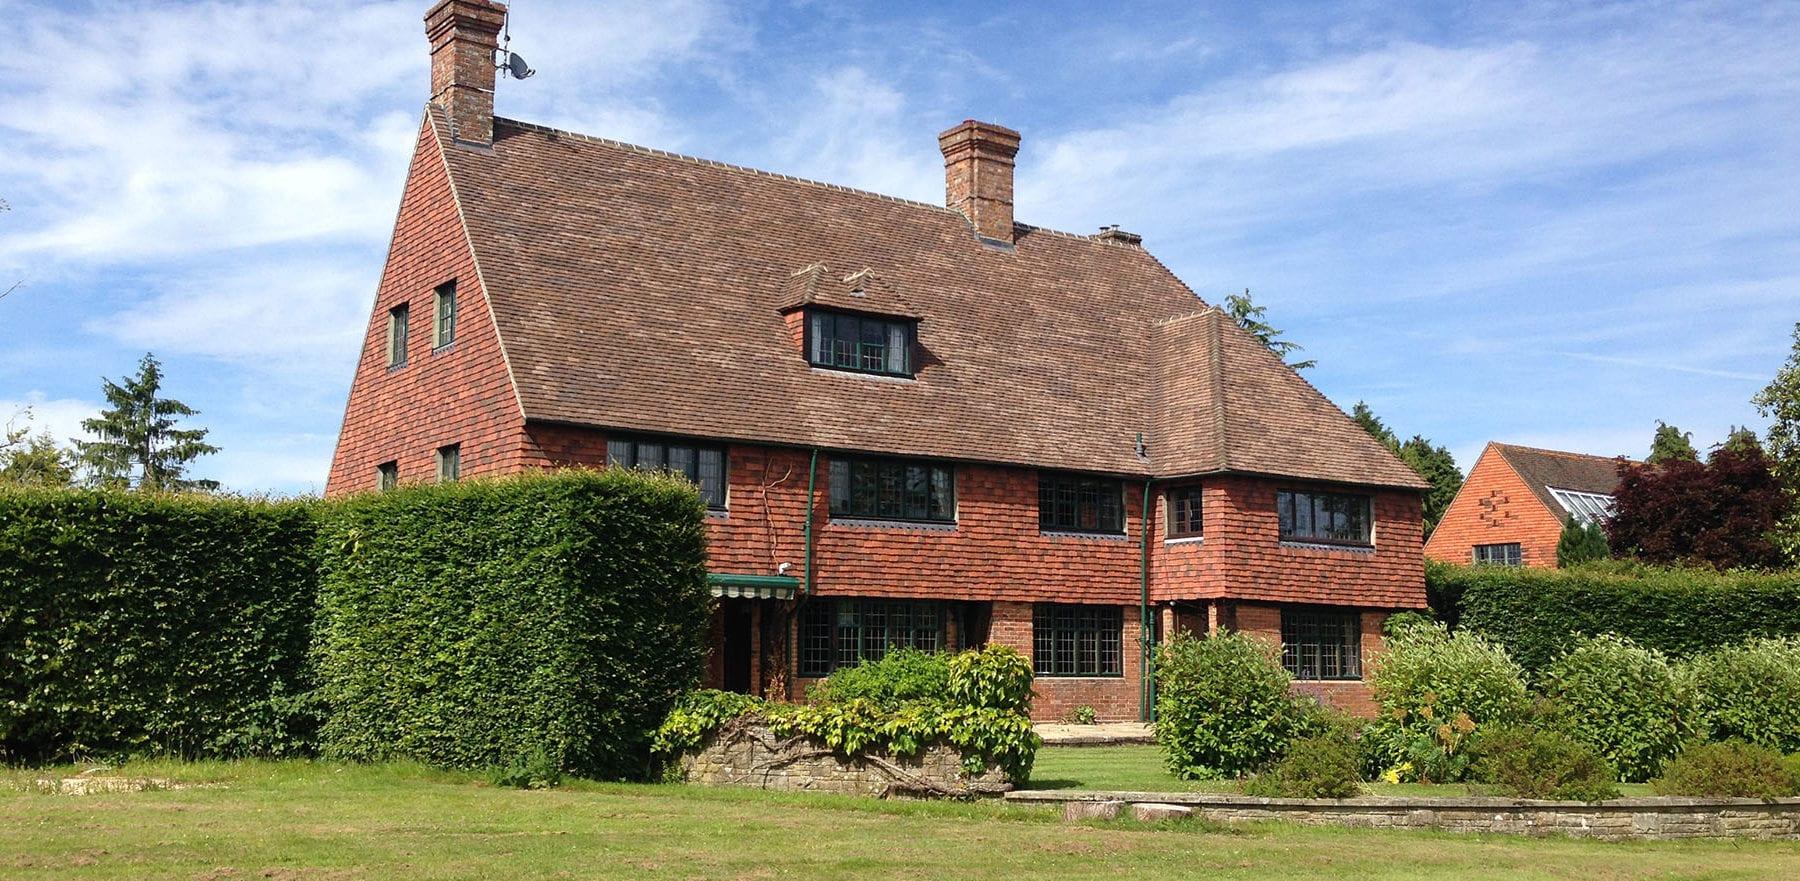 Lifestiles - Handmade Restoration Clay Roof Tiles - Poisenesters, England 3